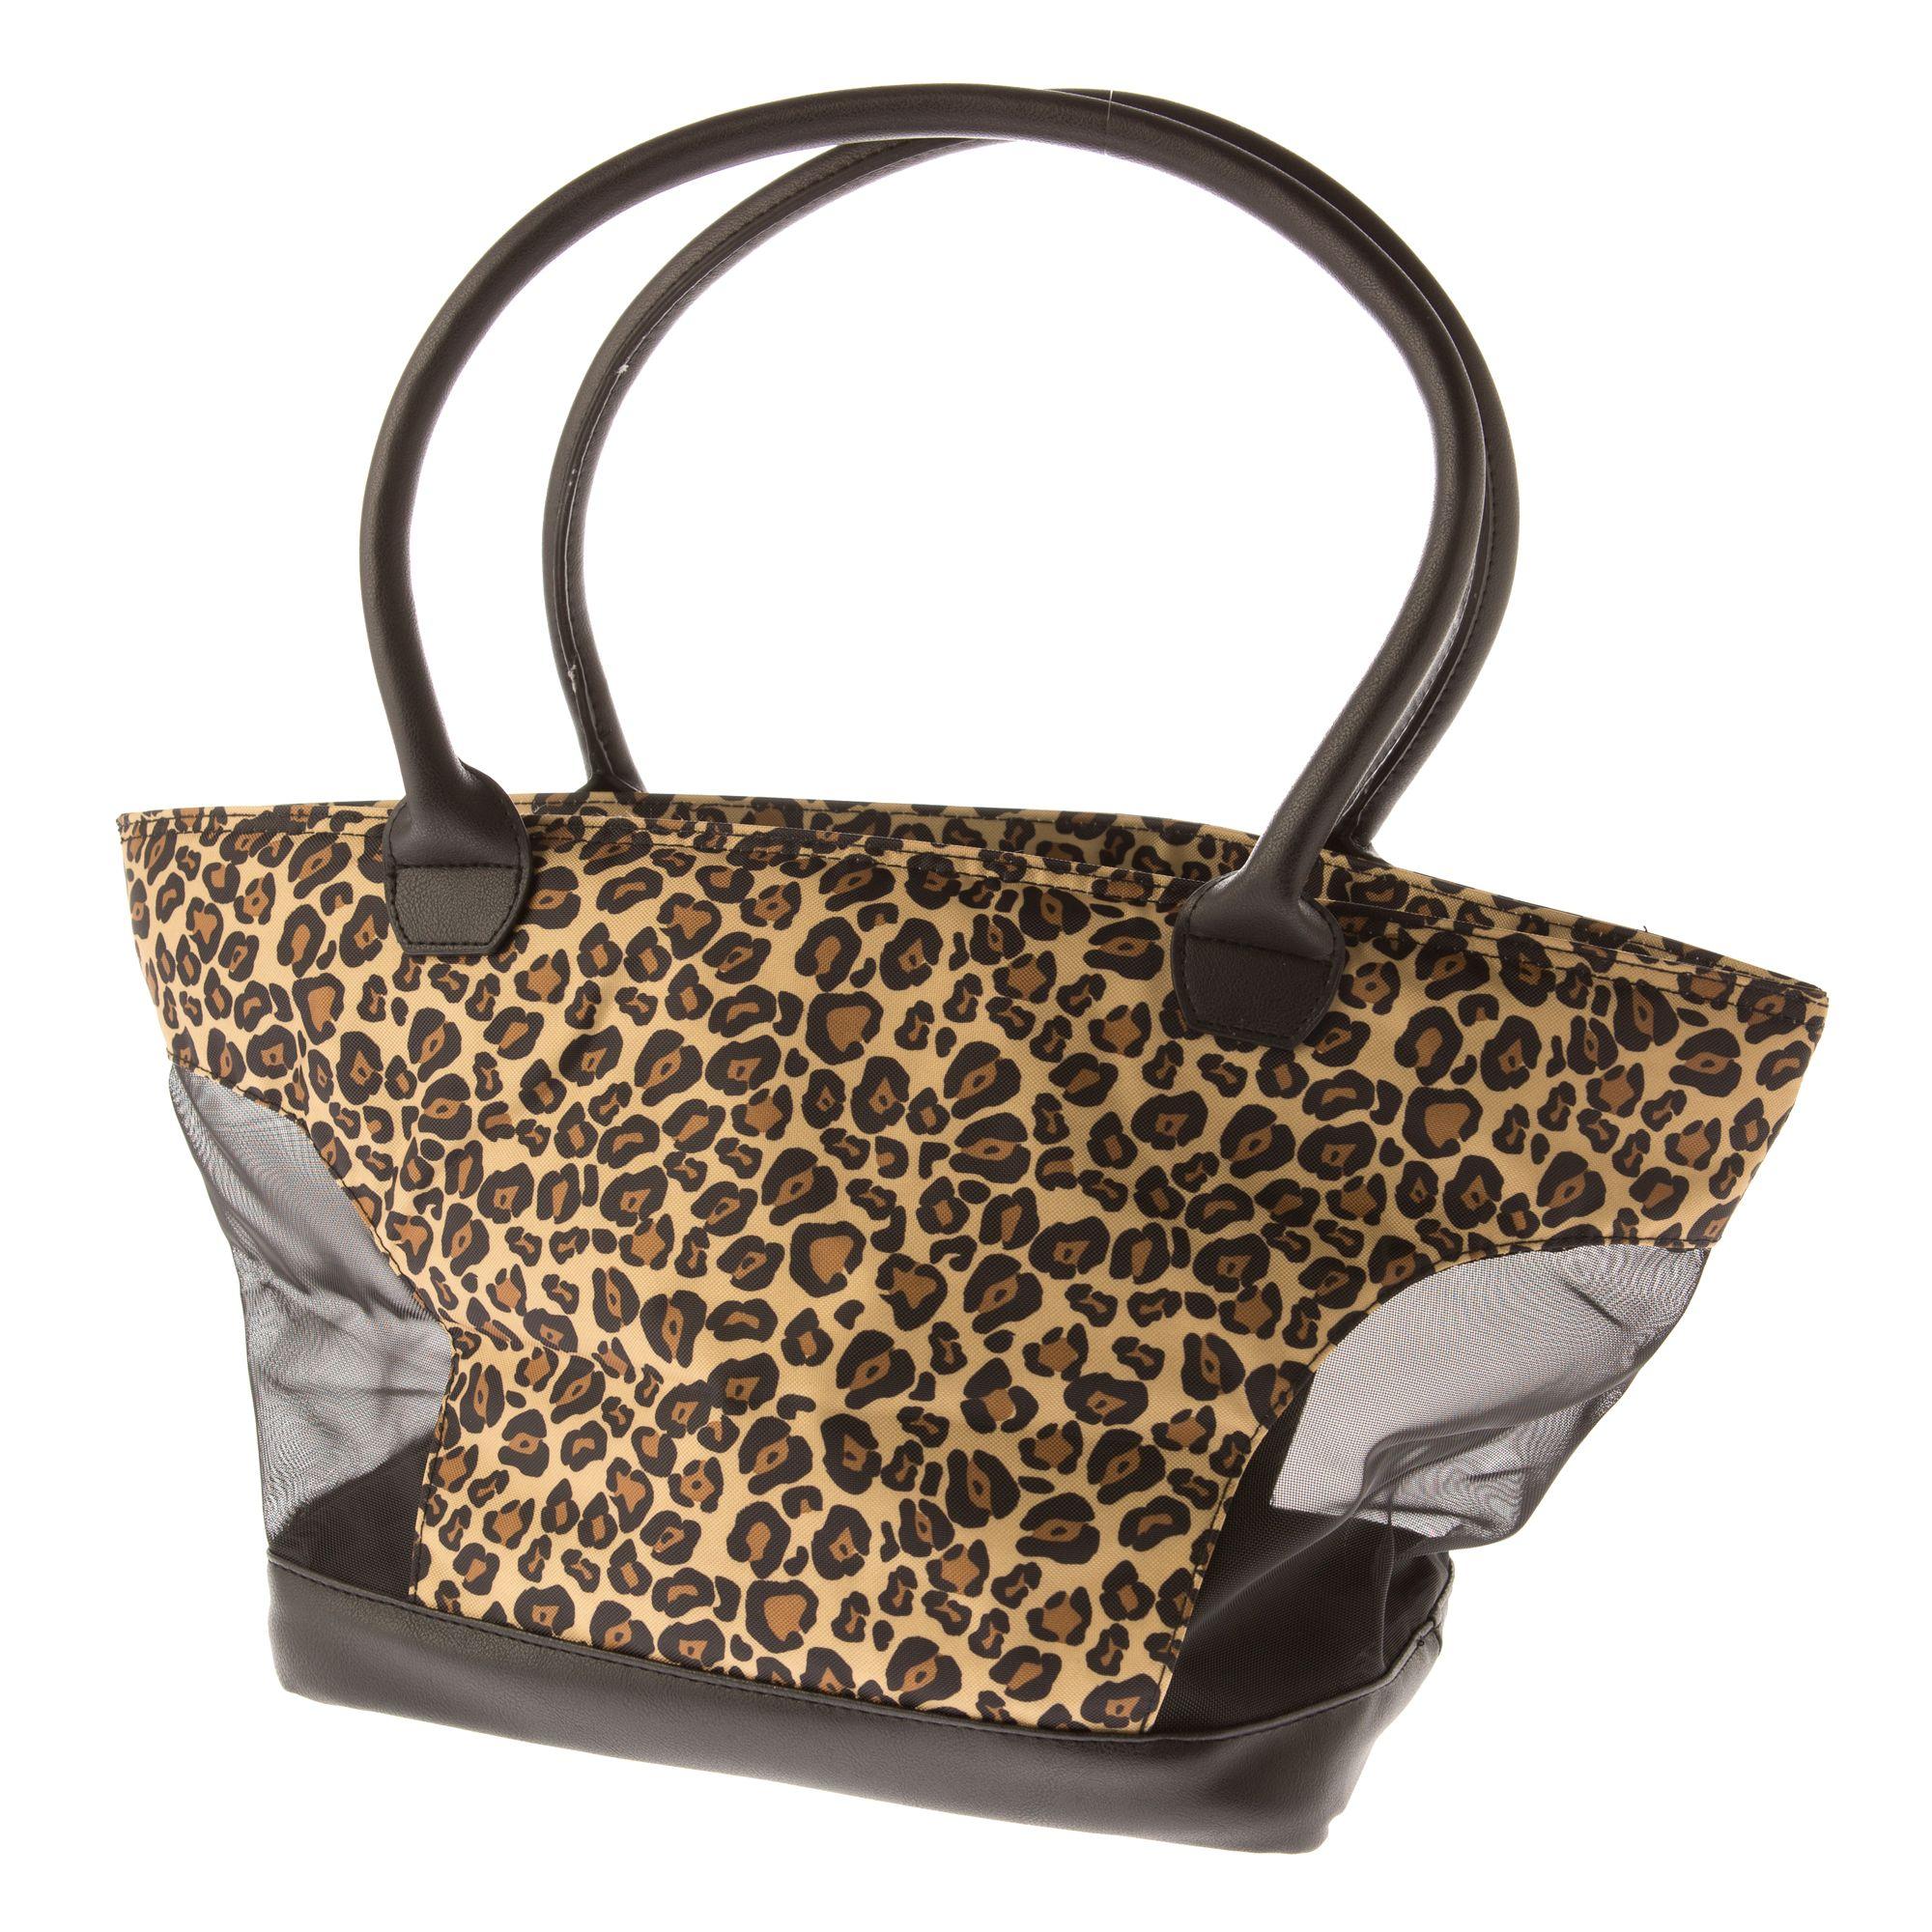 Top Paw® Fashion Dog Tote, Cheetah 5255718